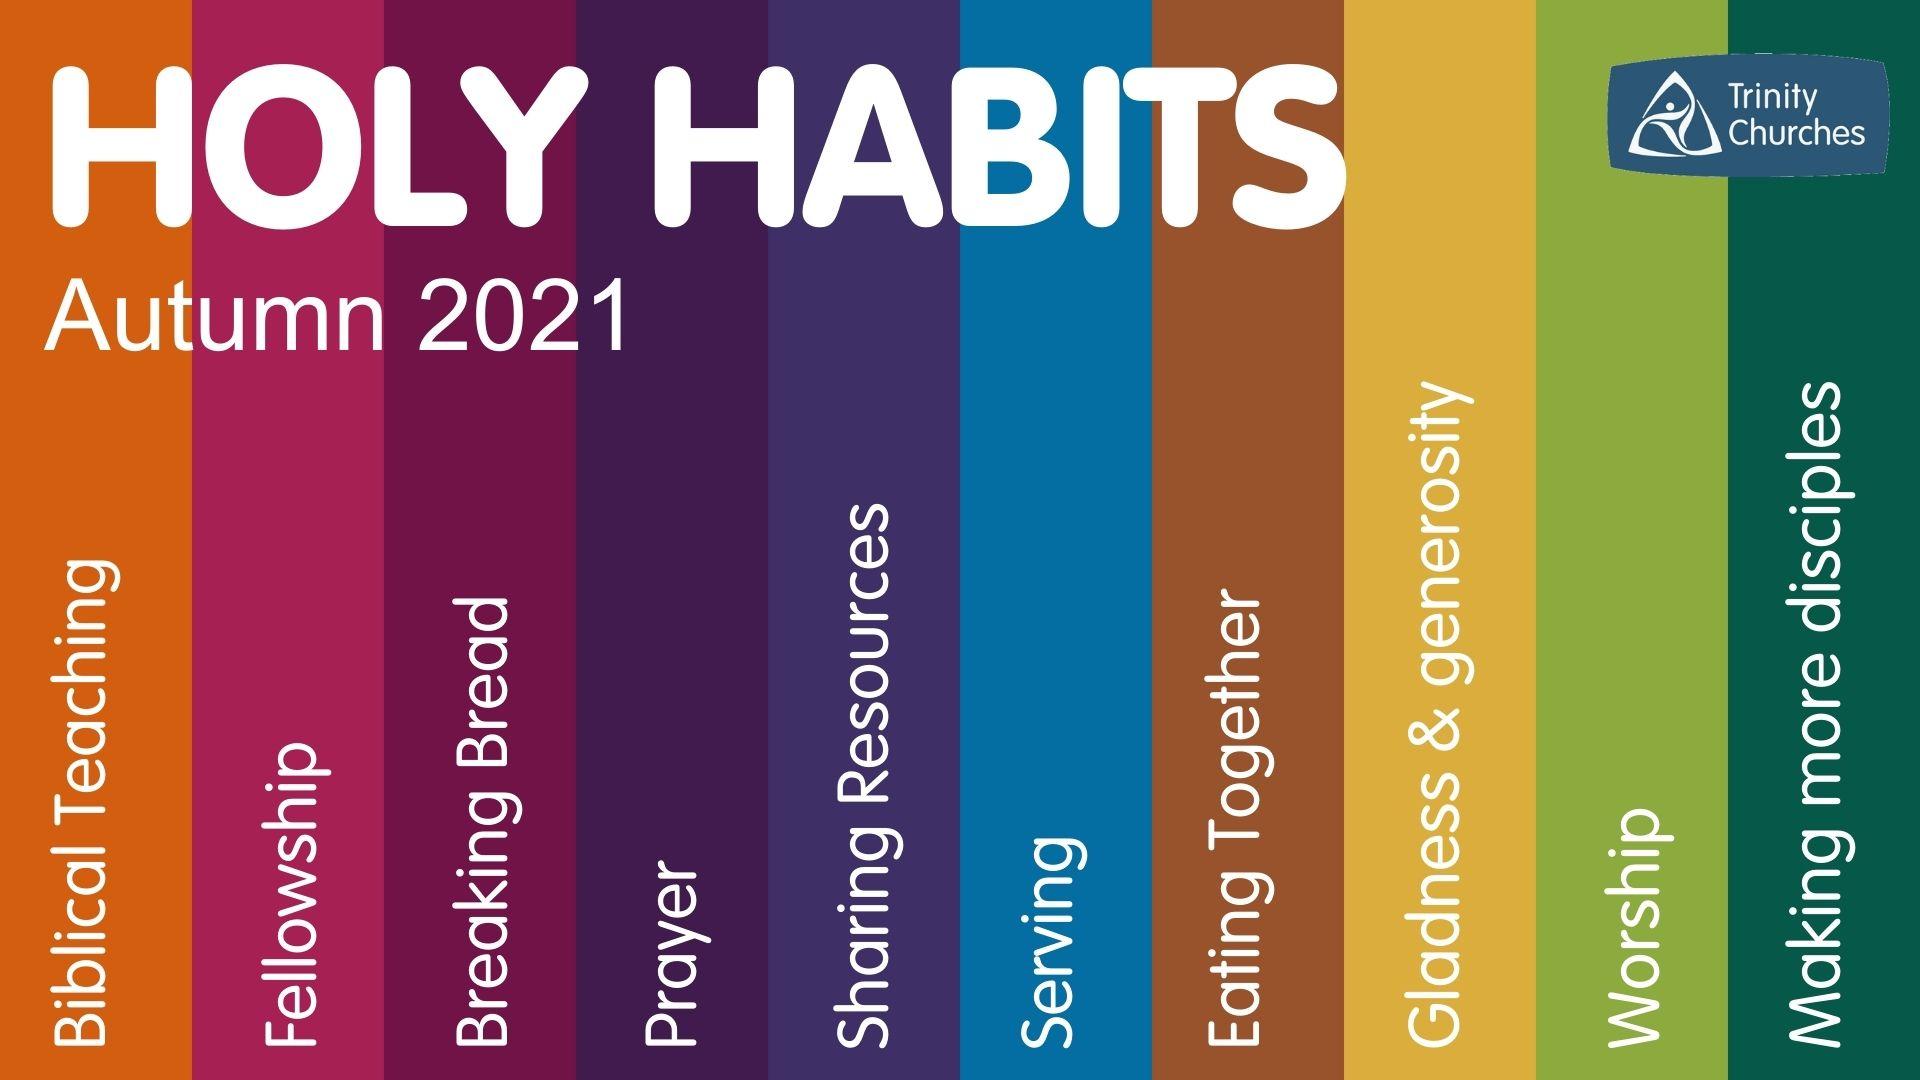 Holy Habits Powerpoint slide.jpg